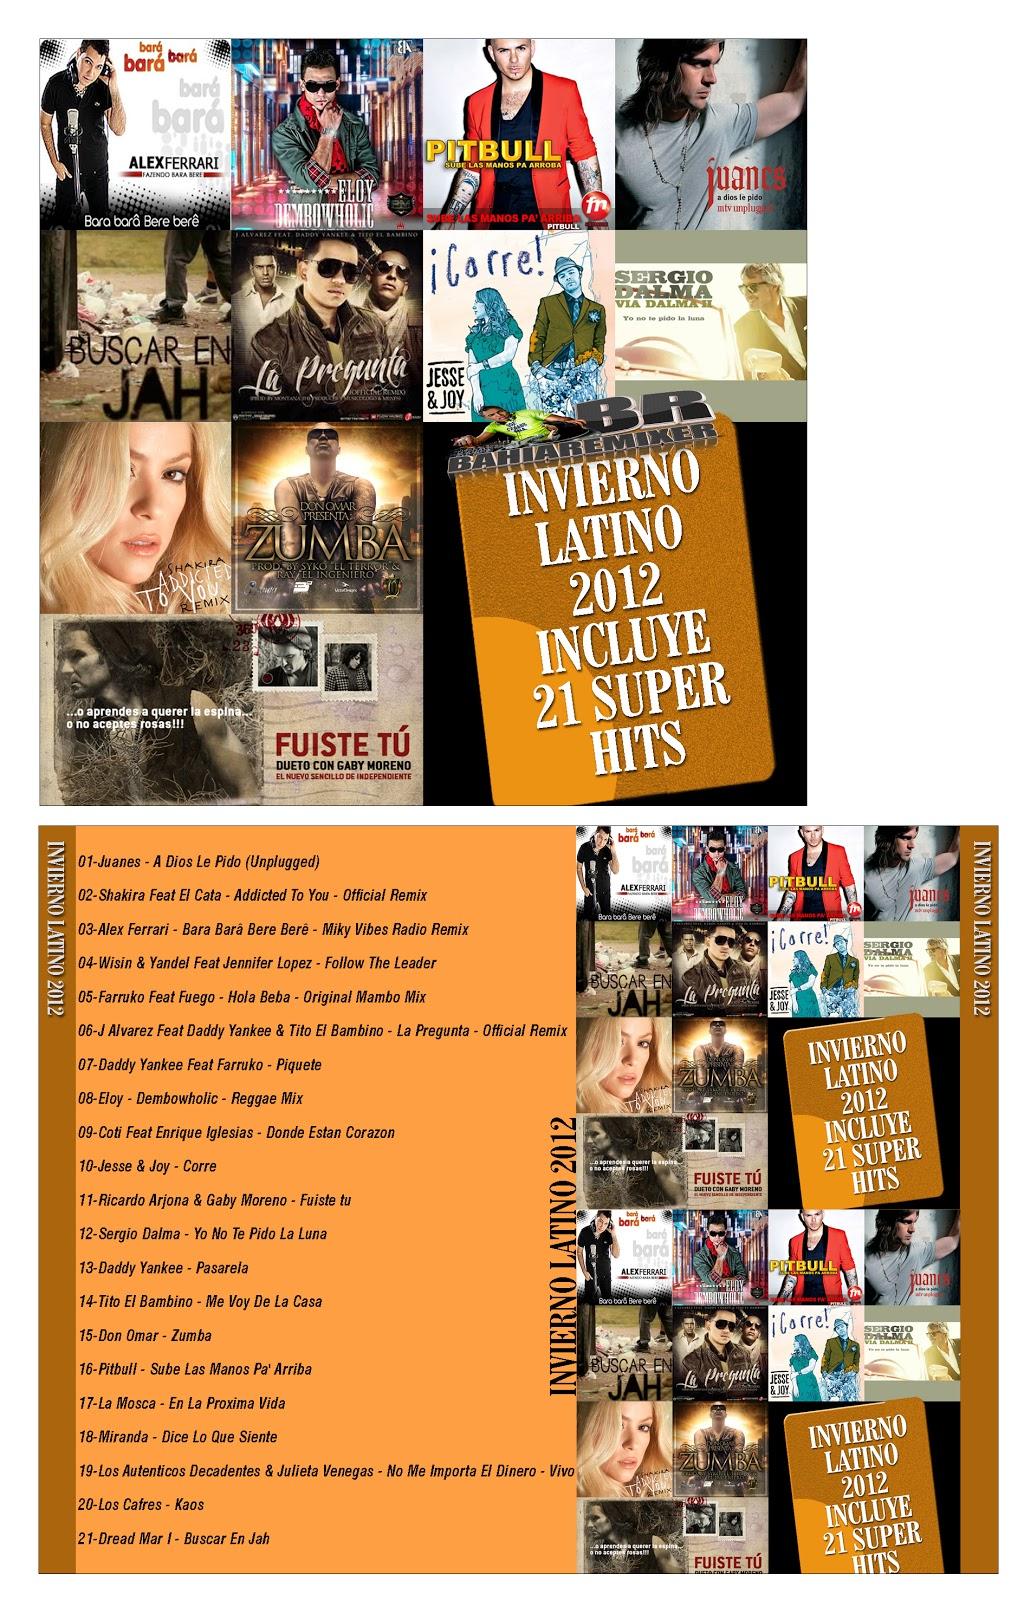 http://3.bp.blogspot.com/-EQJJRll2hxQ/UMdnd3r90dI/AAAAAAAAAgU/aAz5bbVn8Zo/s1600/Invierno+Latino+2012.jpg